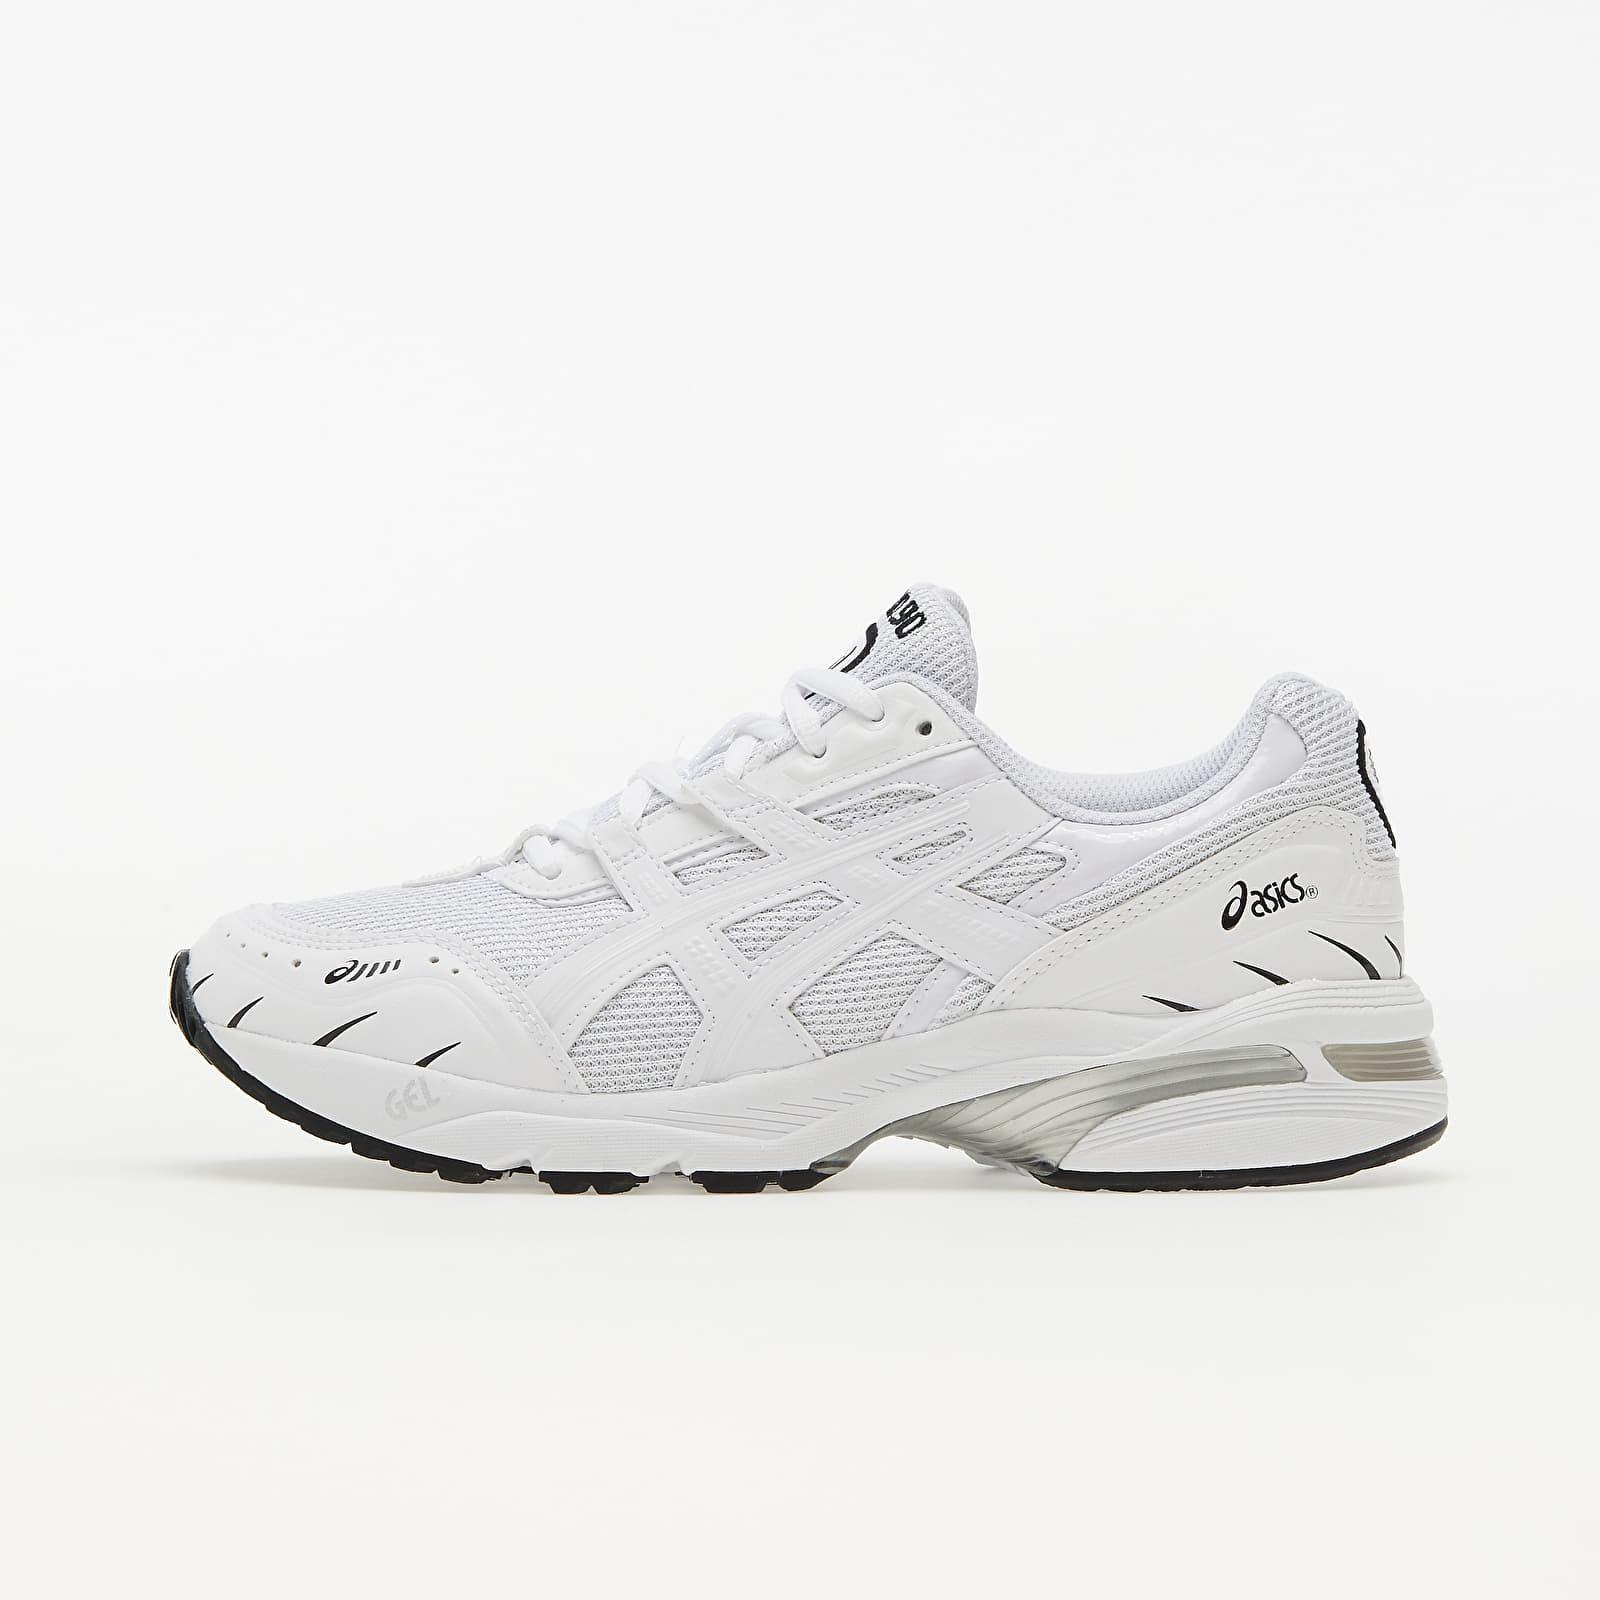 Asics GEL-1090 White/ White 1022A215-101